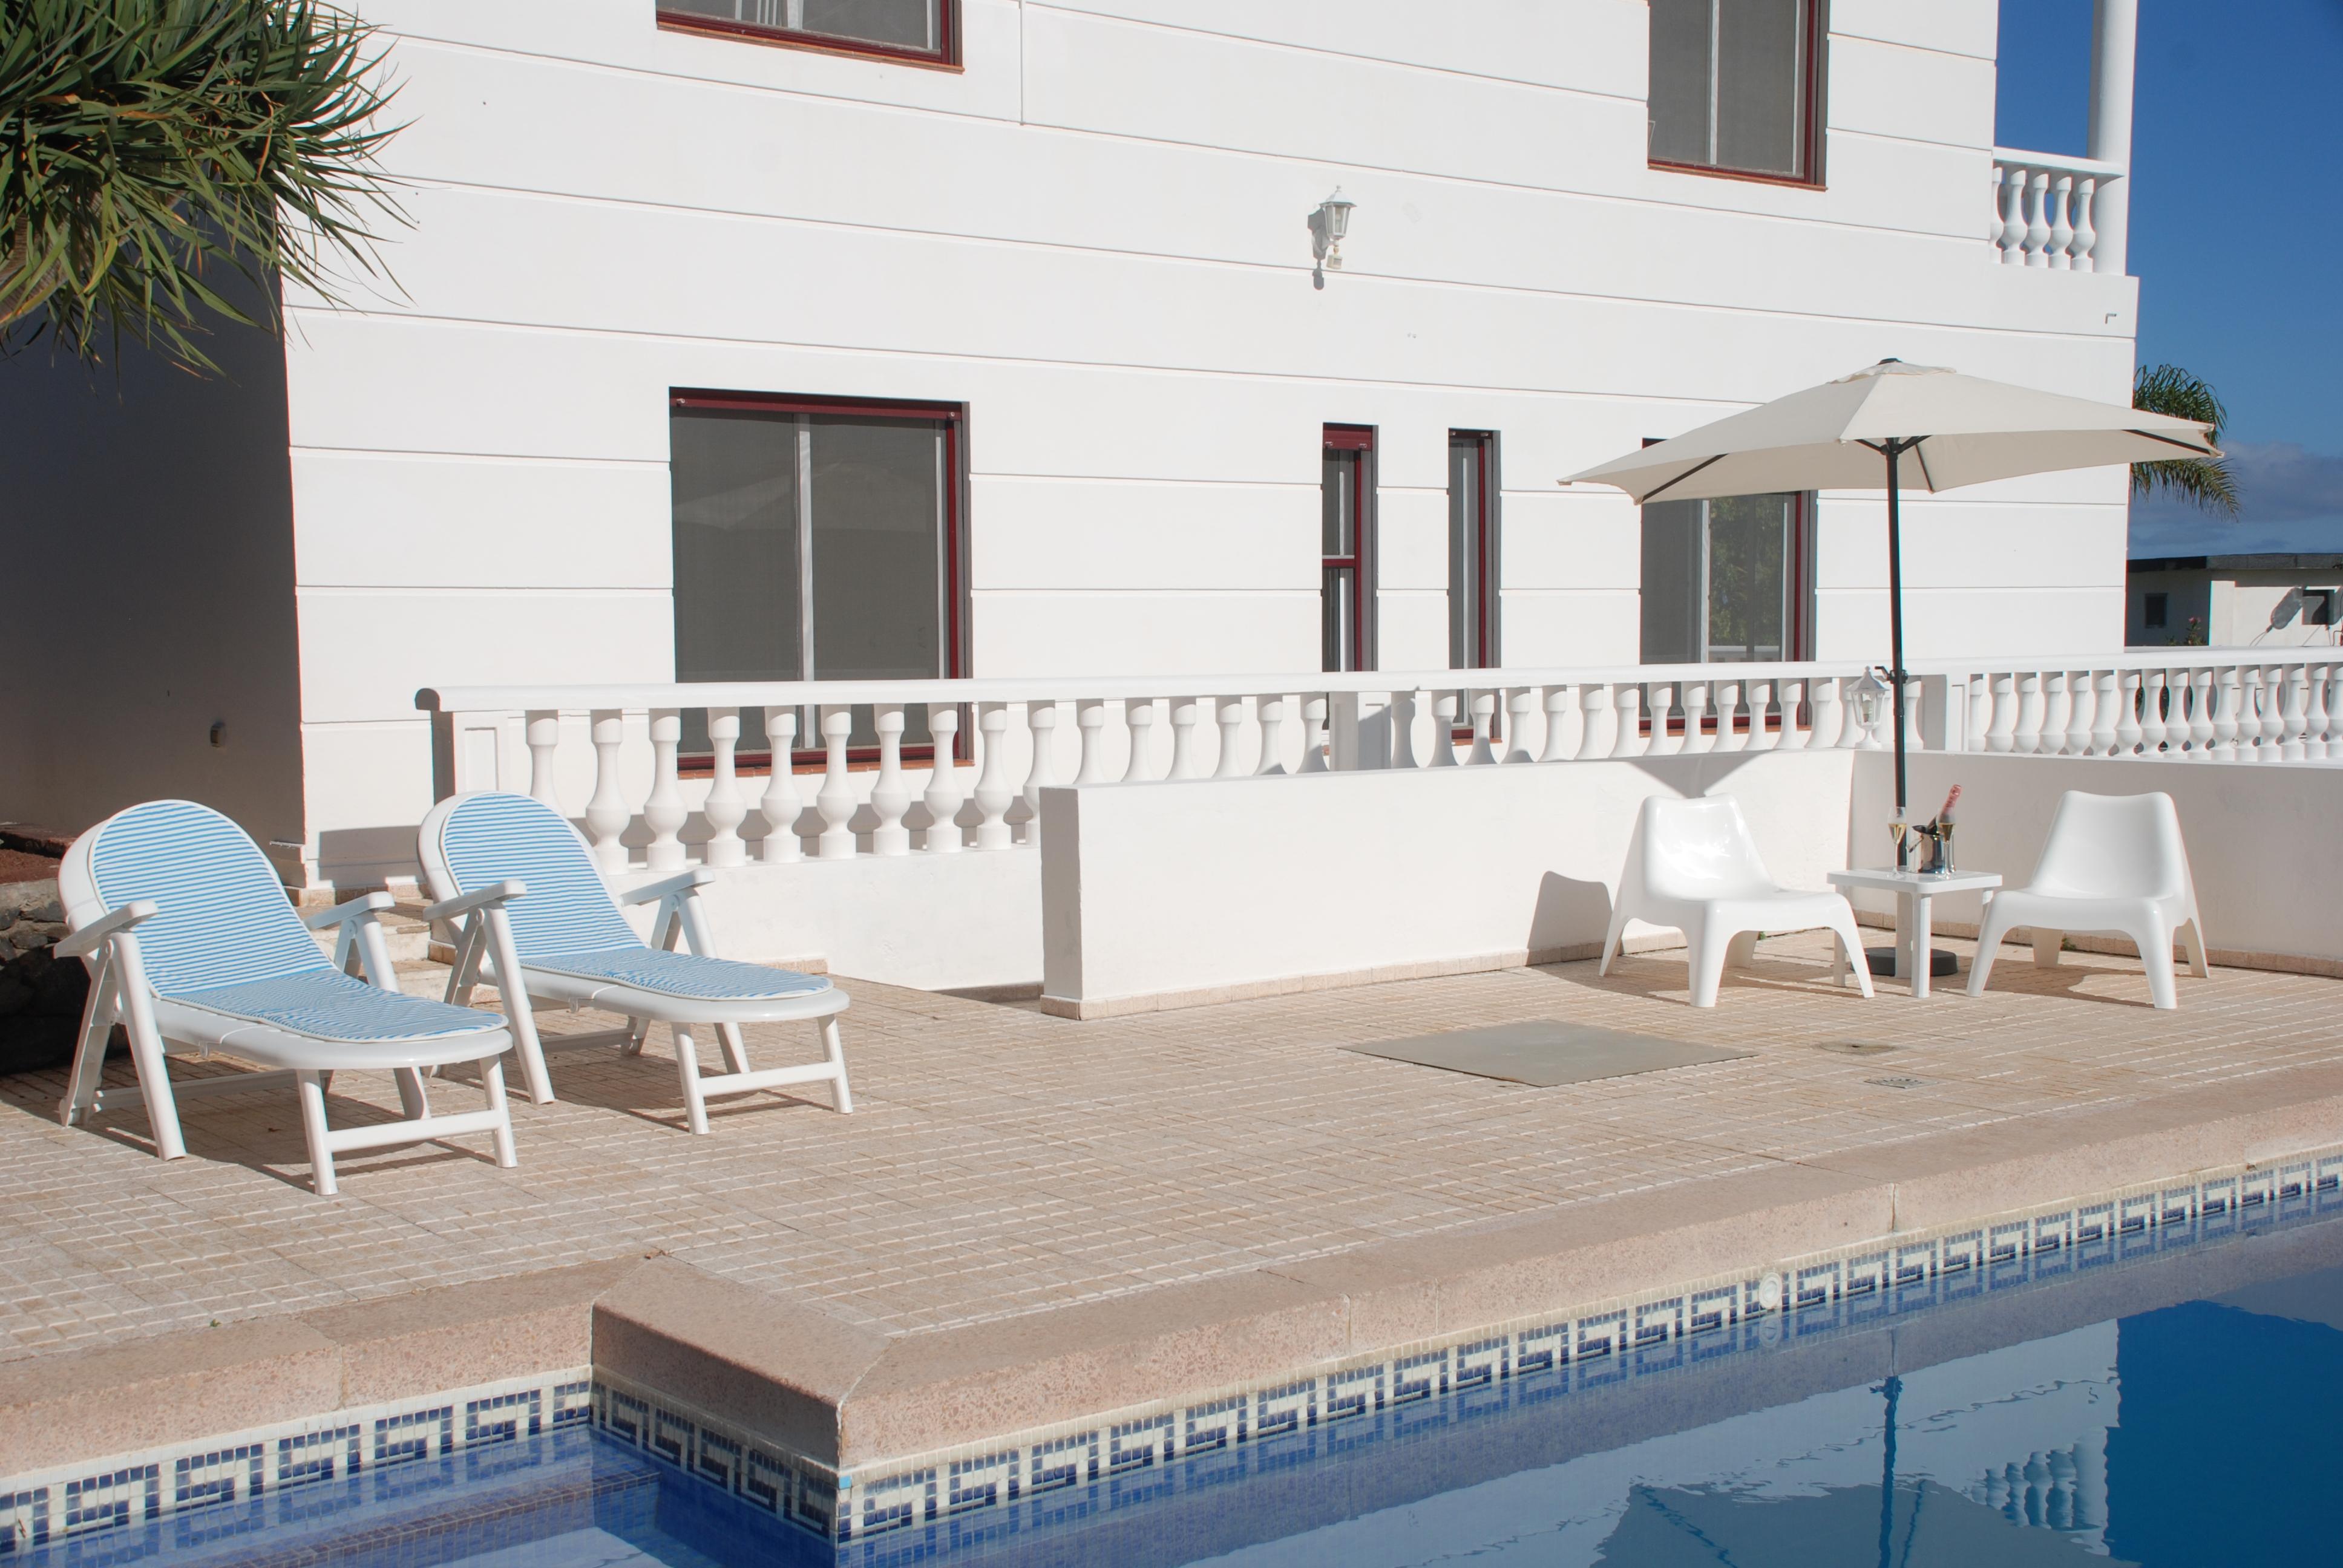 Maison de vacances Villa Vista La Quinta beheizbarer Pool kostenloses WLAN Grill (2124407), Santa Ursula, Ténérife, Iles Canaries, Espagne, image 73